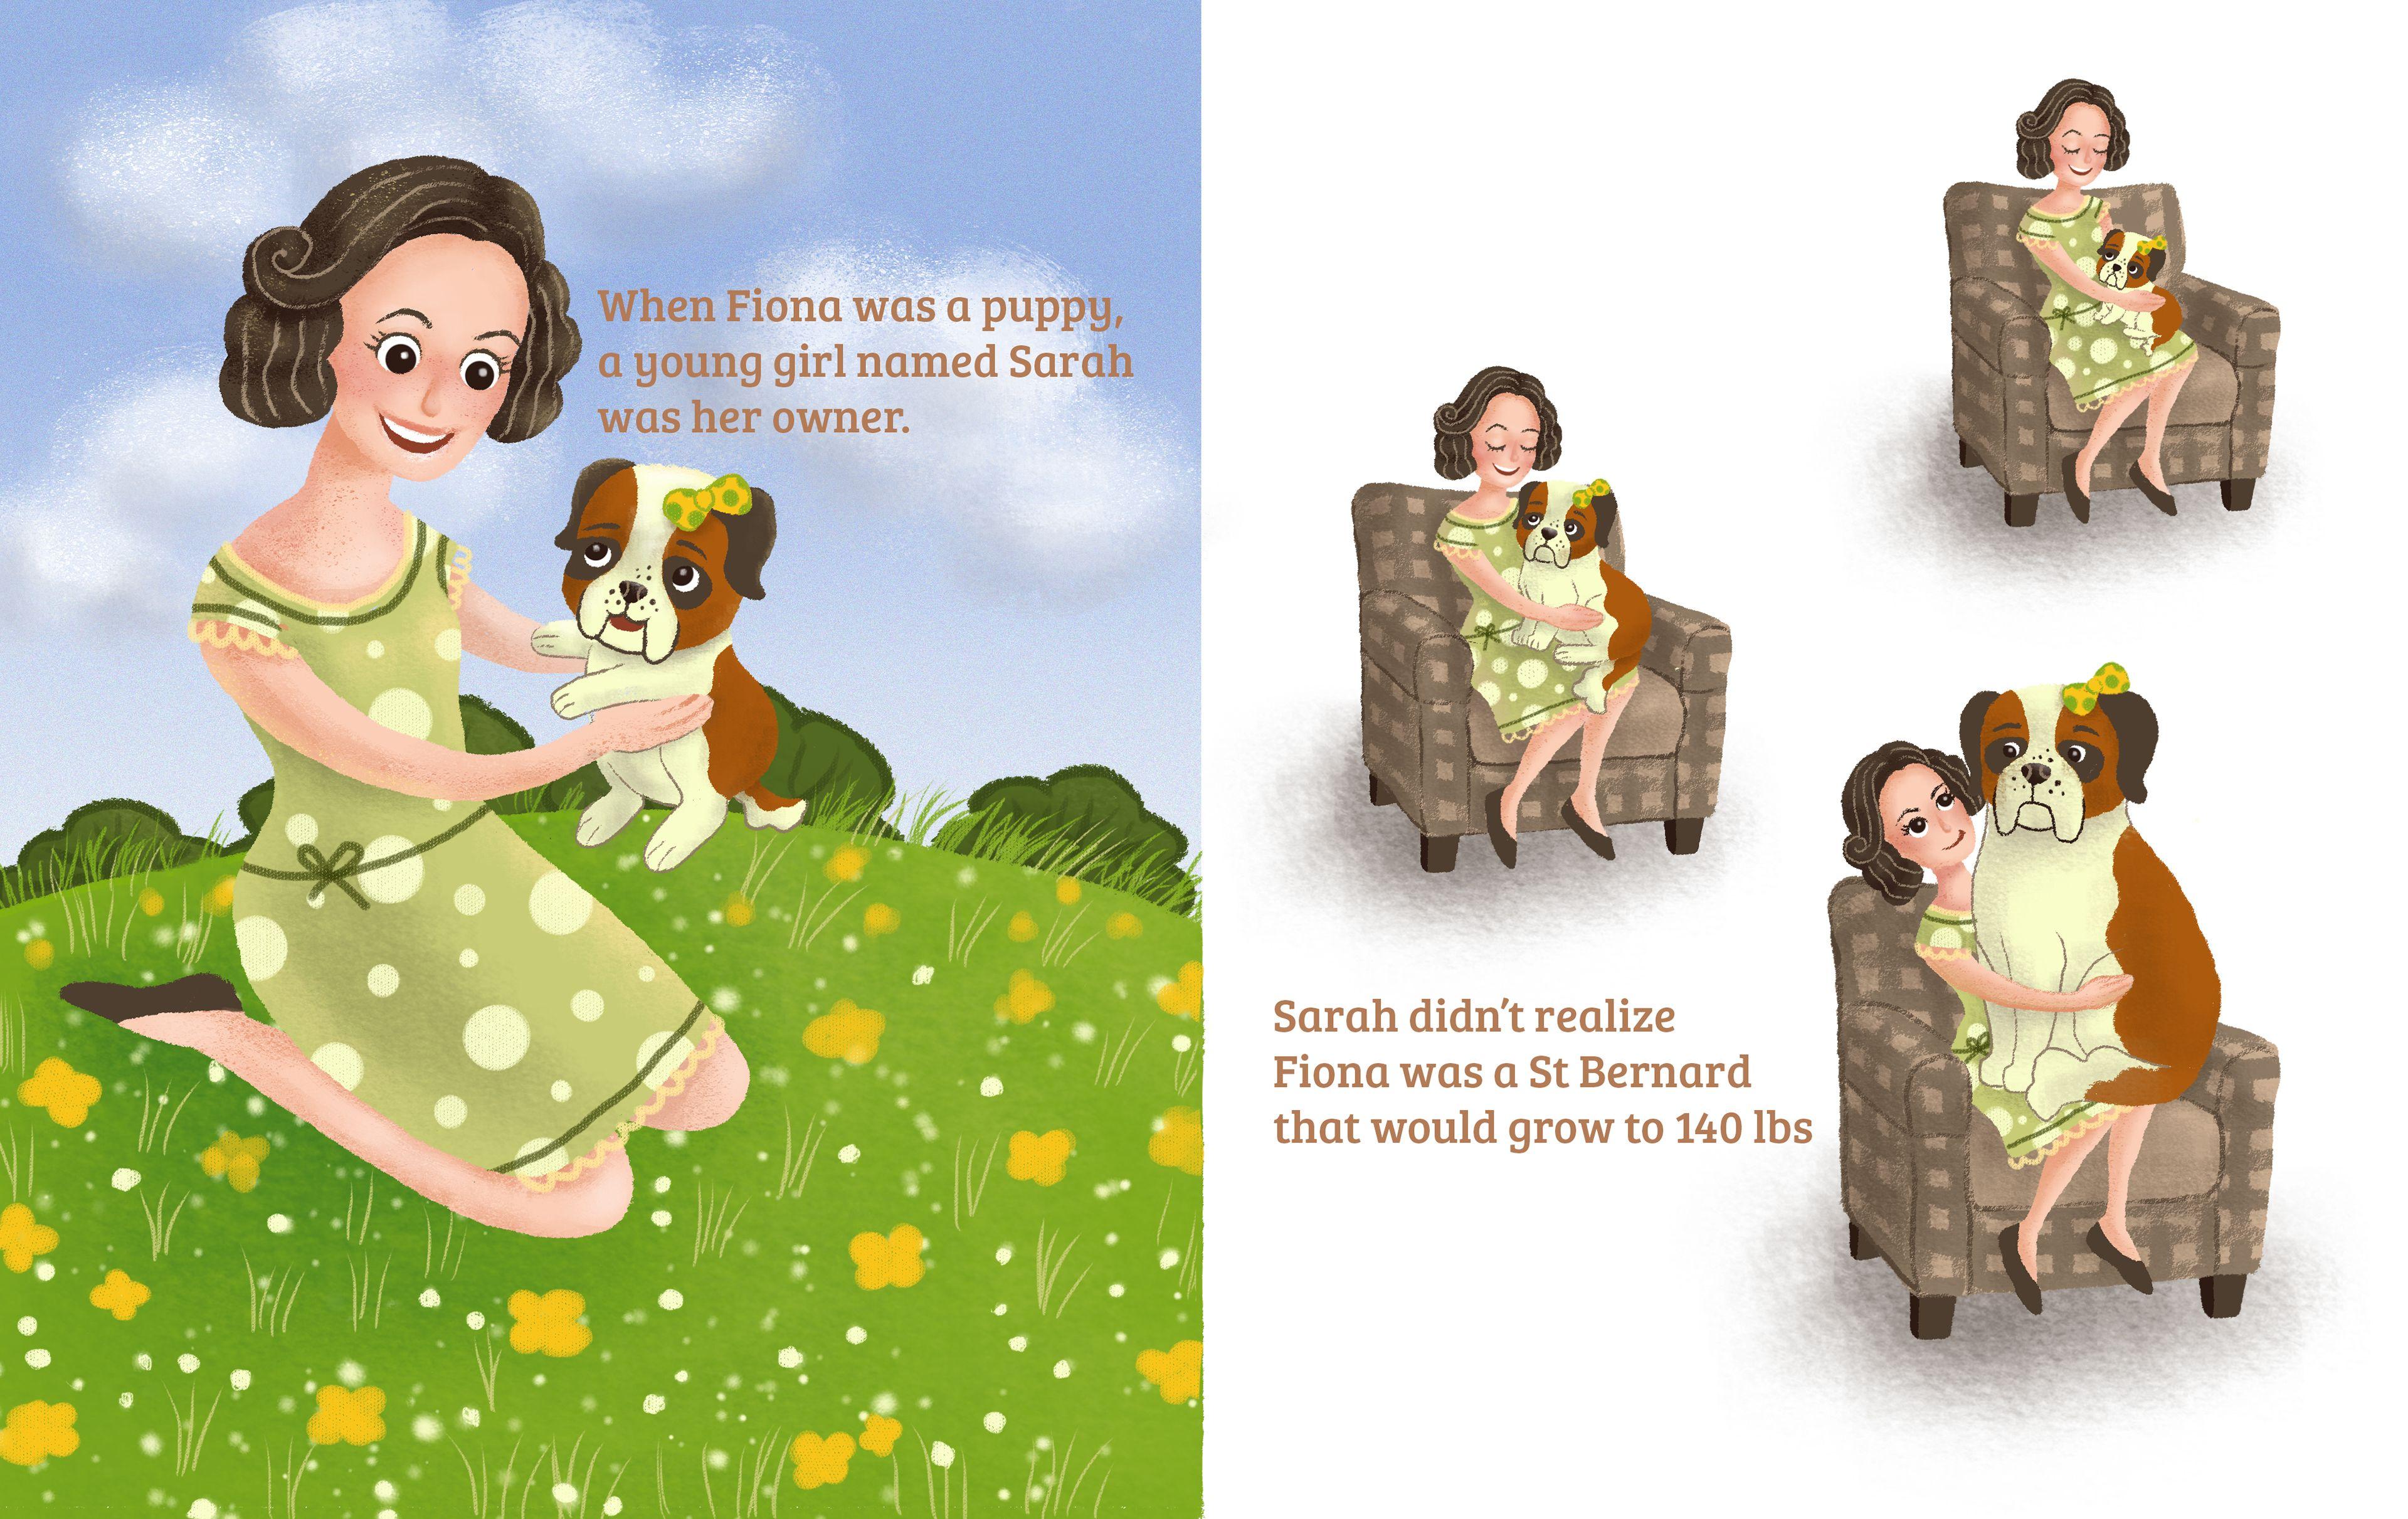 Children S Book Illustration Kids Illustration Cartooncharacter Design Picture Story Book Illustration Children S Book Illustration Children Illustration